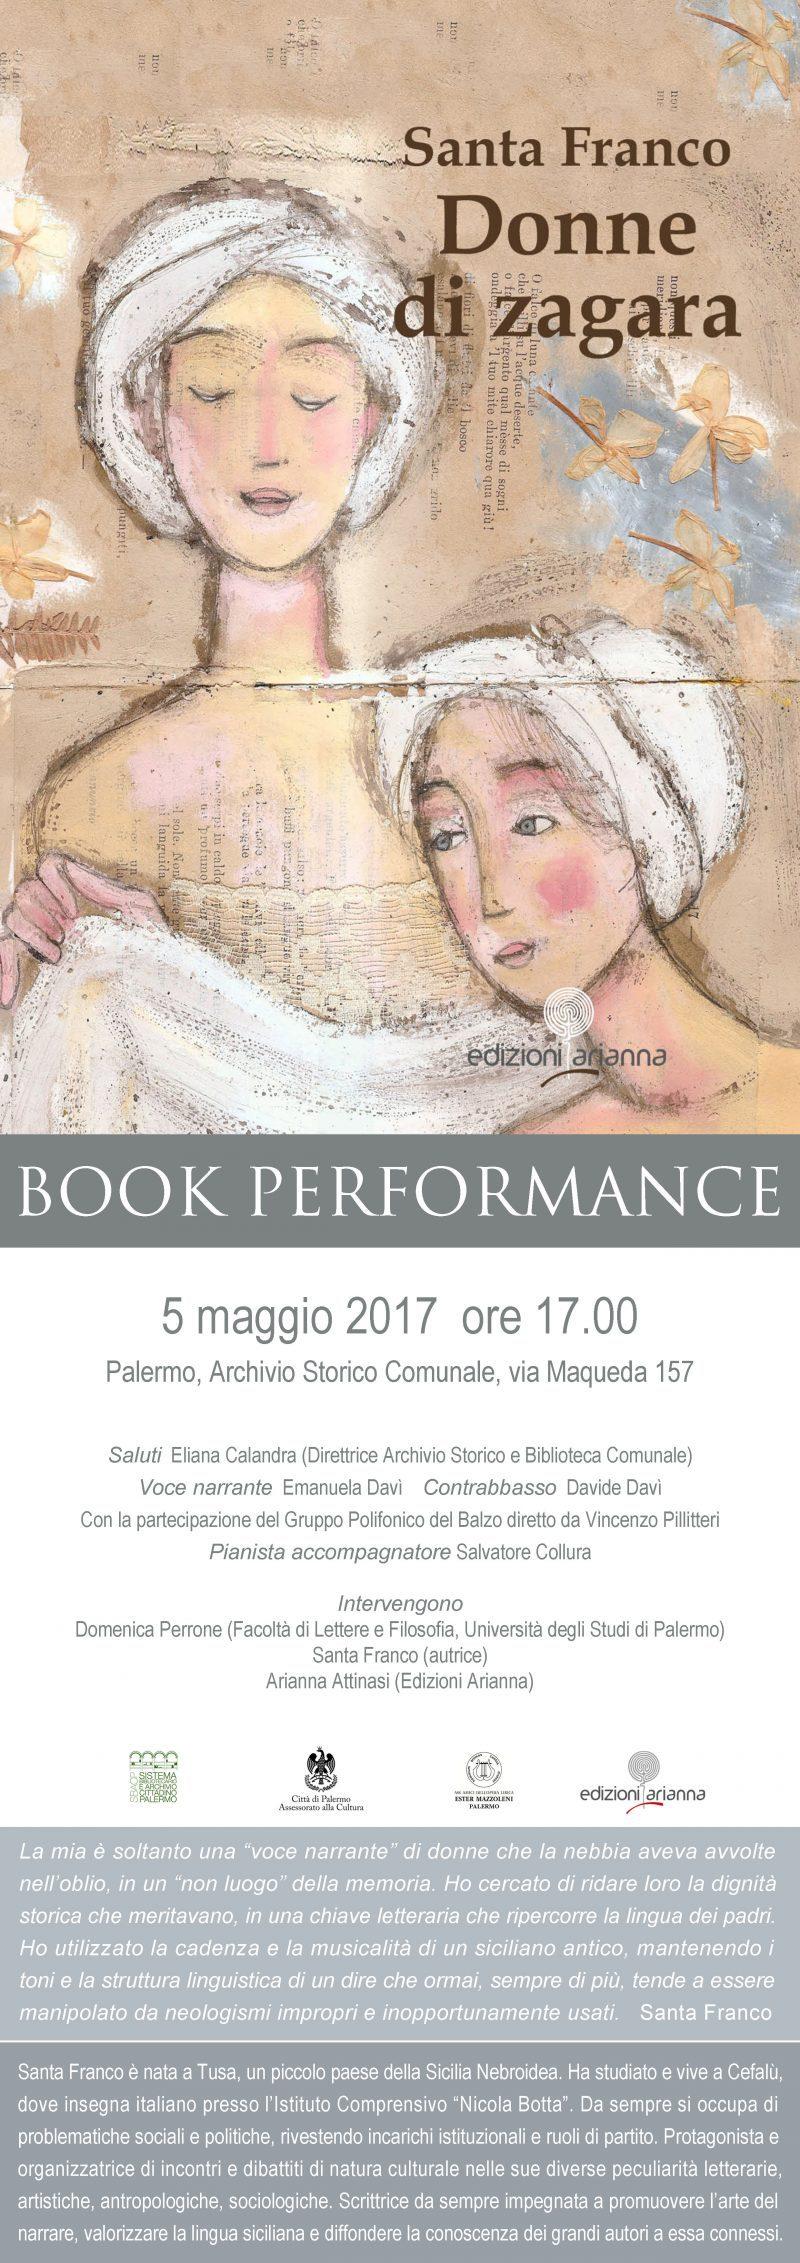 Donne di zagara Book Performance Palermo - Edizioni Arianna